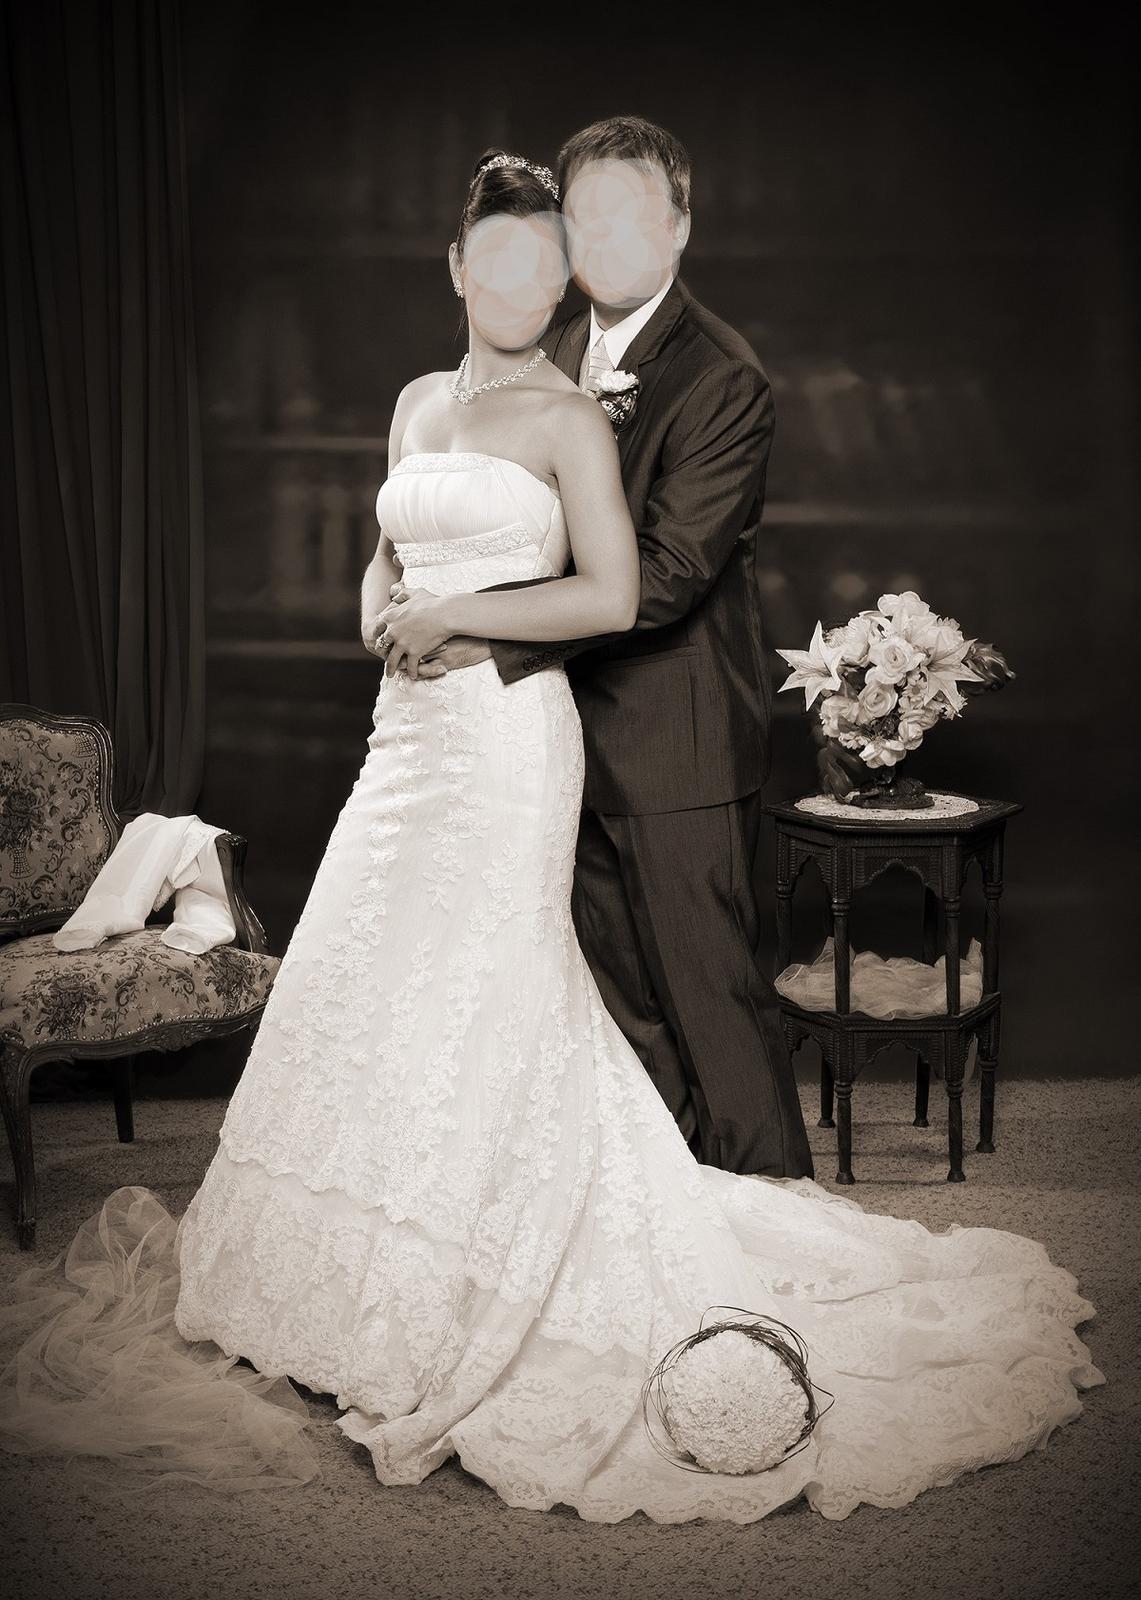 Destino svadobne šaty značky La Sposa - Obrázok č. 4